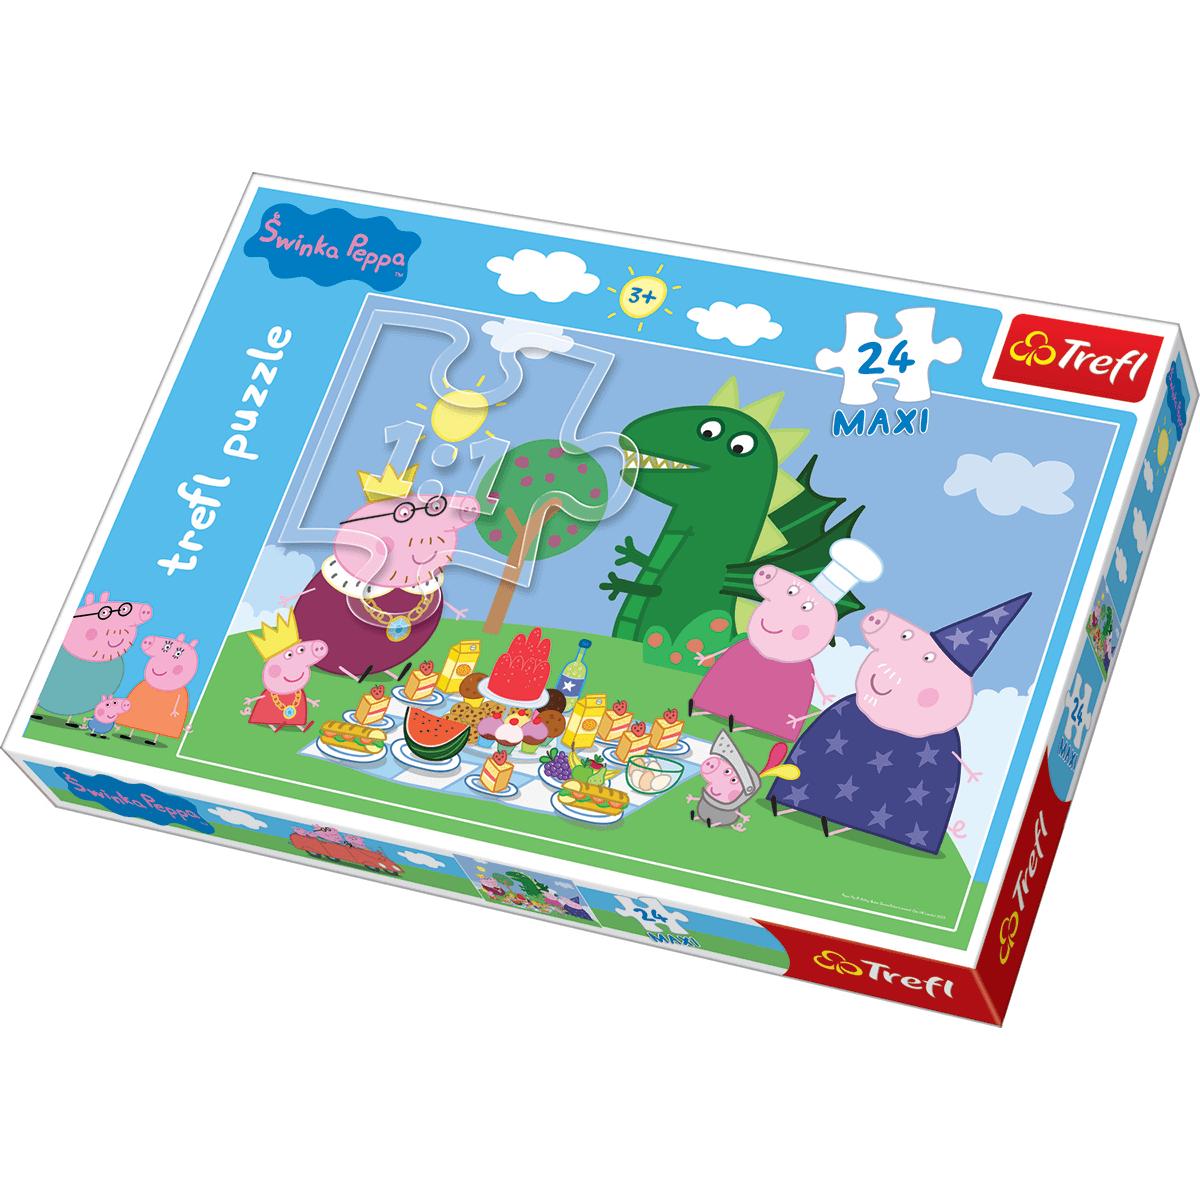 Trefl - Peppa Pig Maxi 24pc Puzzle